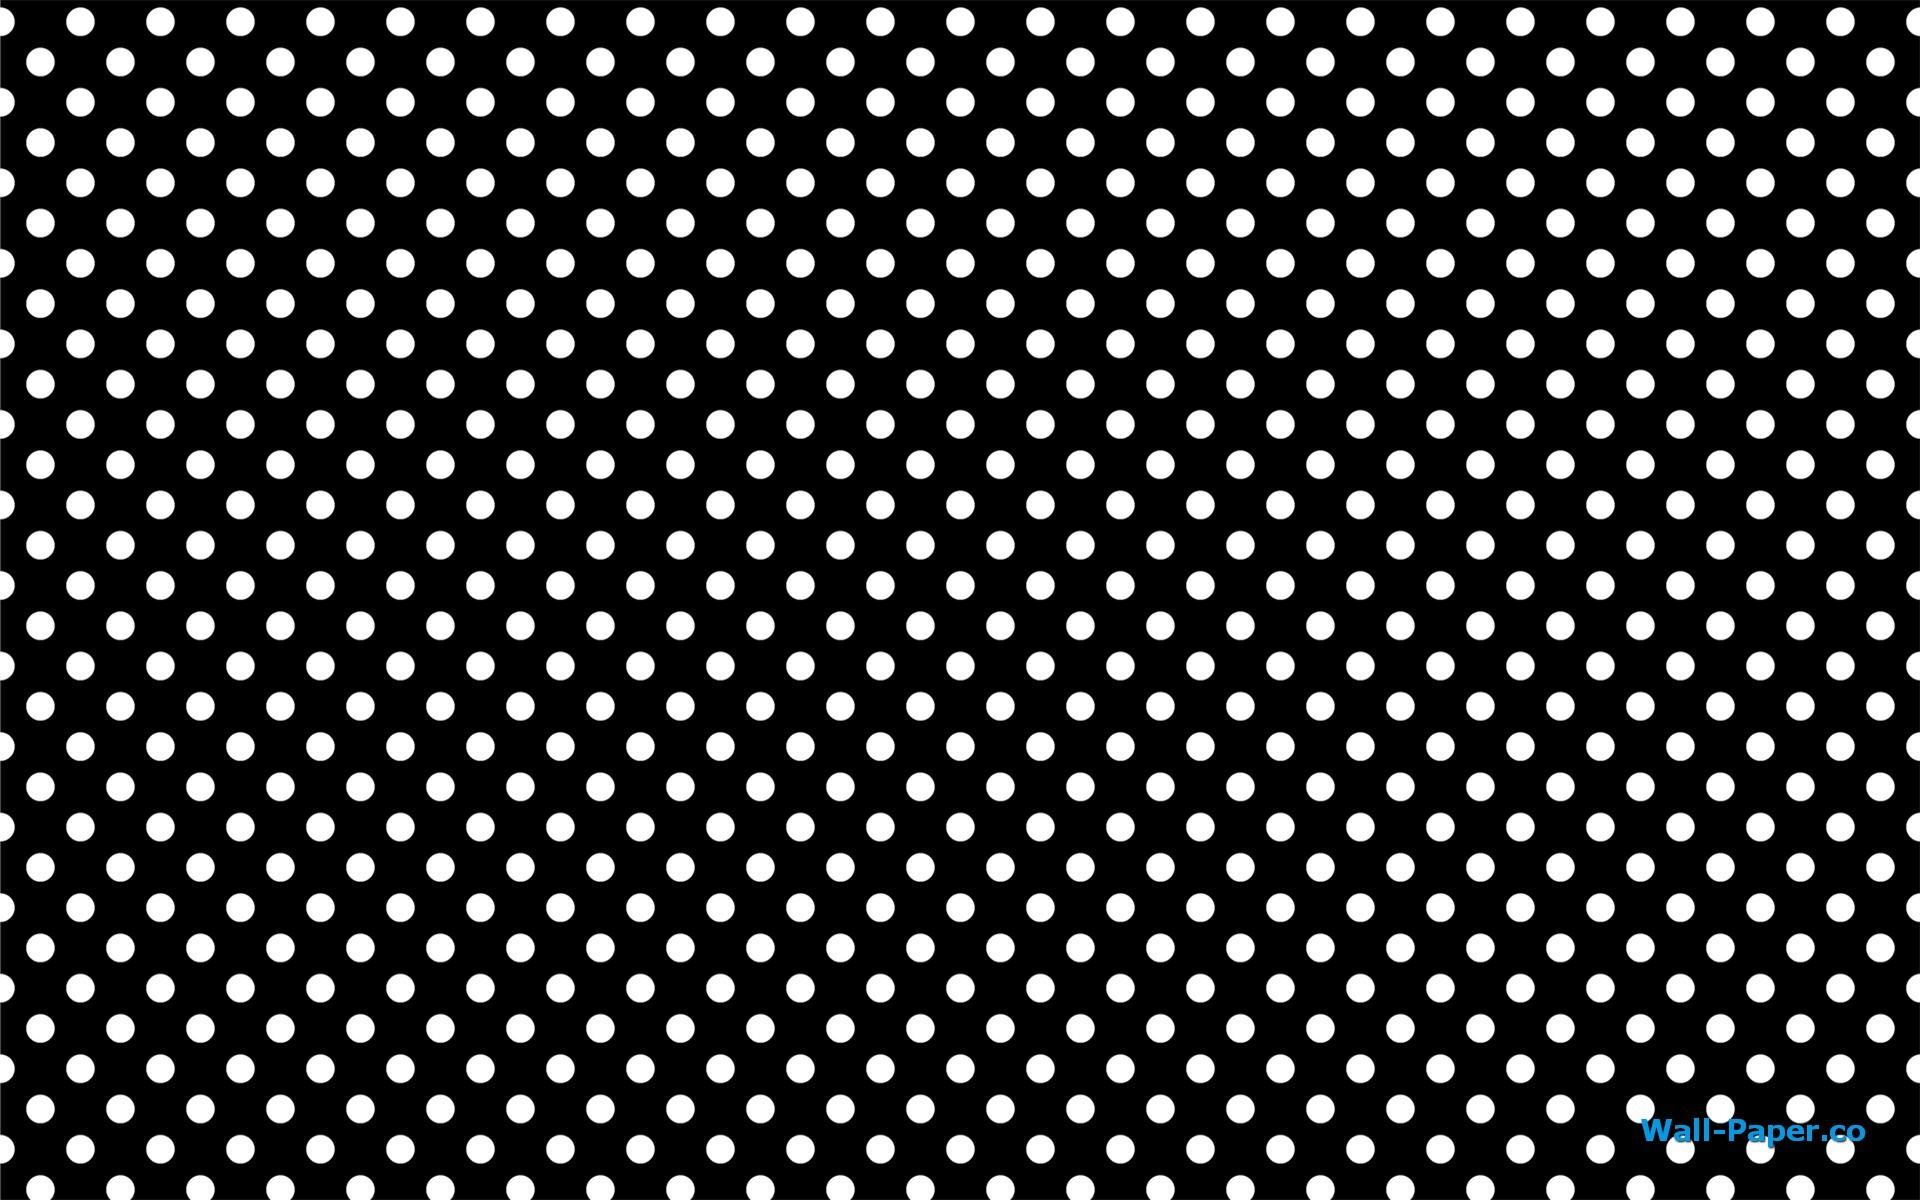 polka dot wallpapers 51 images